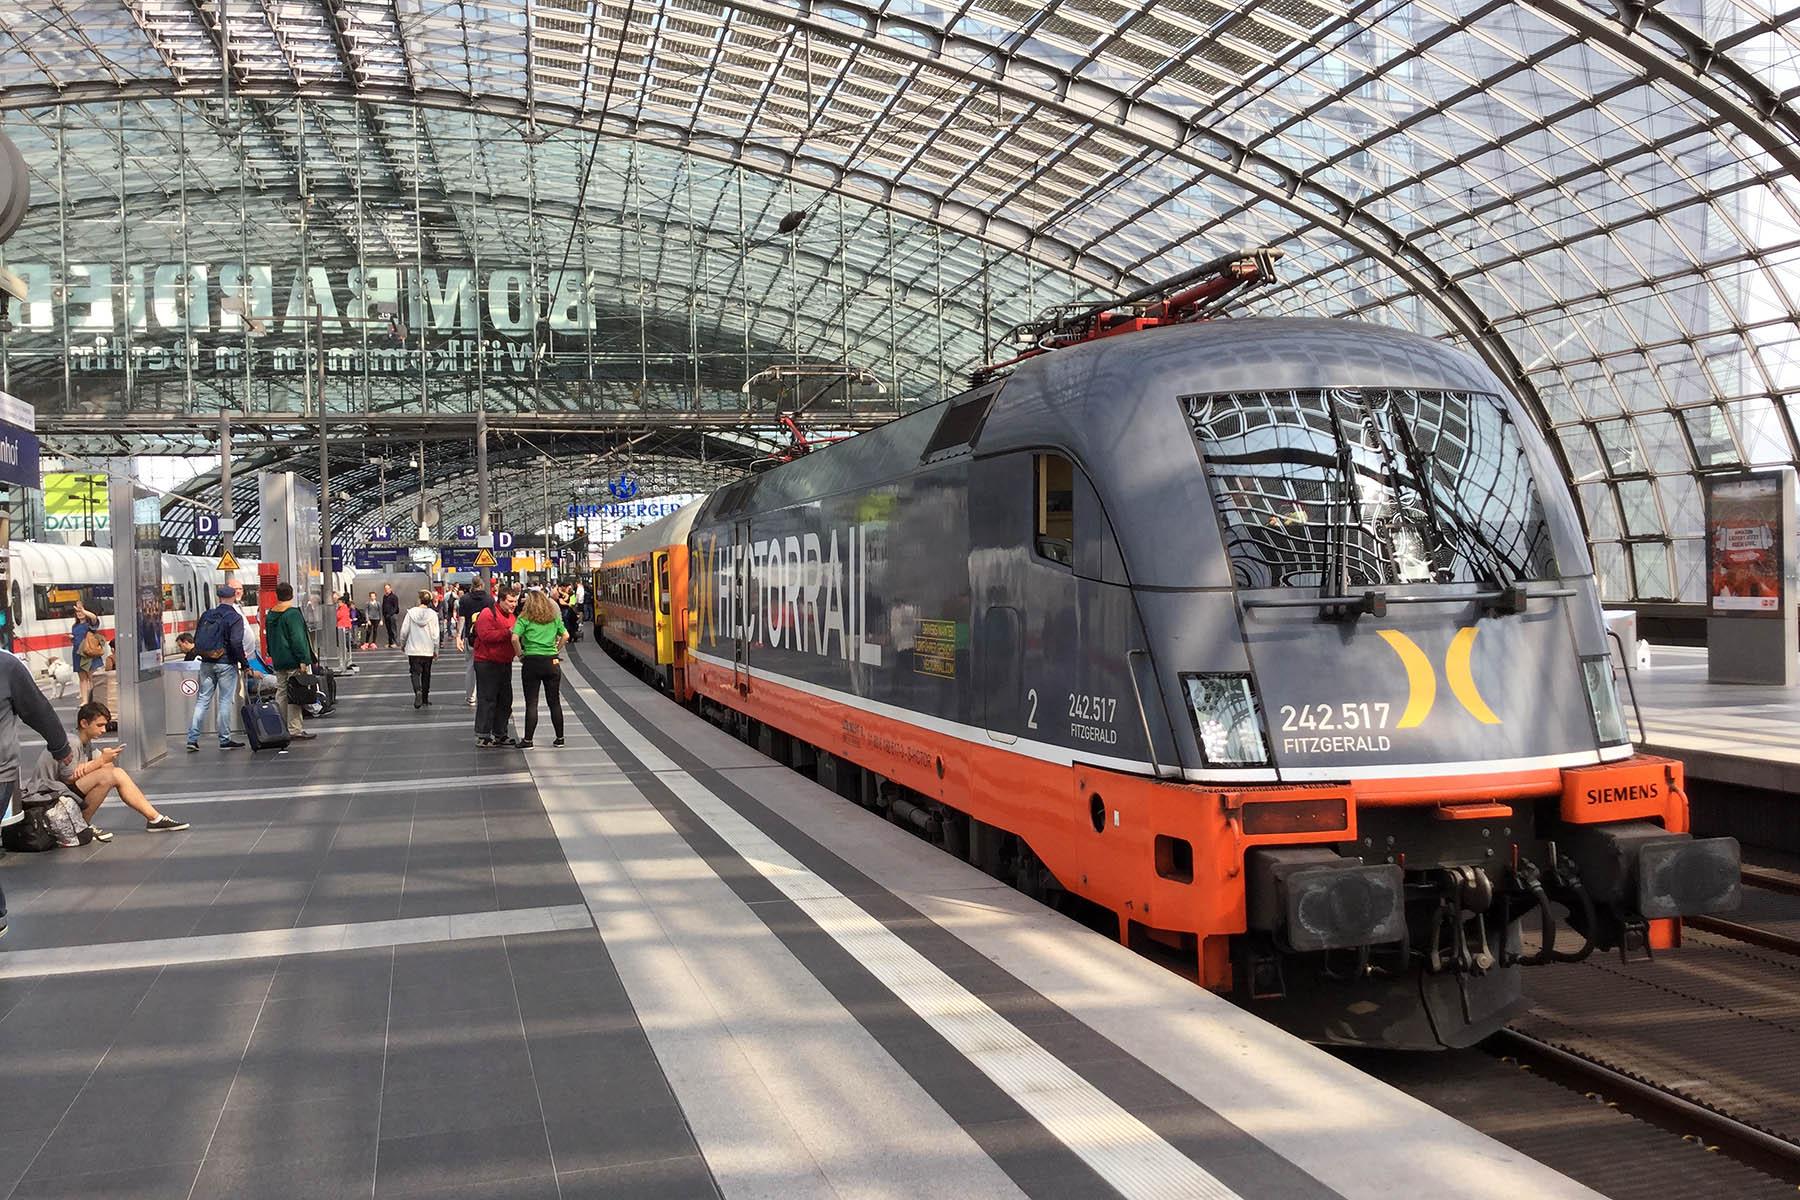 Souprava LEO Express Locomore, Berlin Hbf, foto: Zdopravy.cz